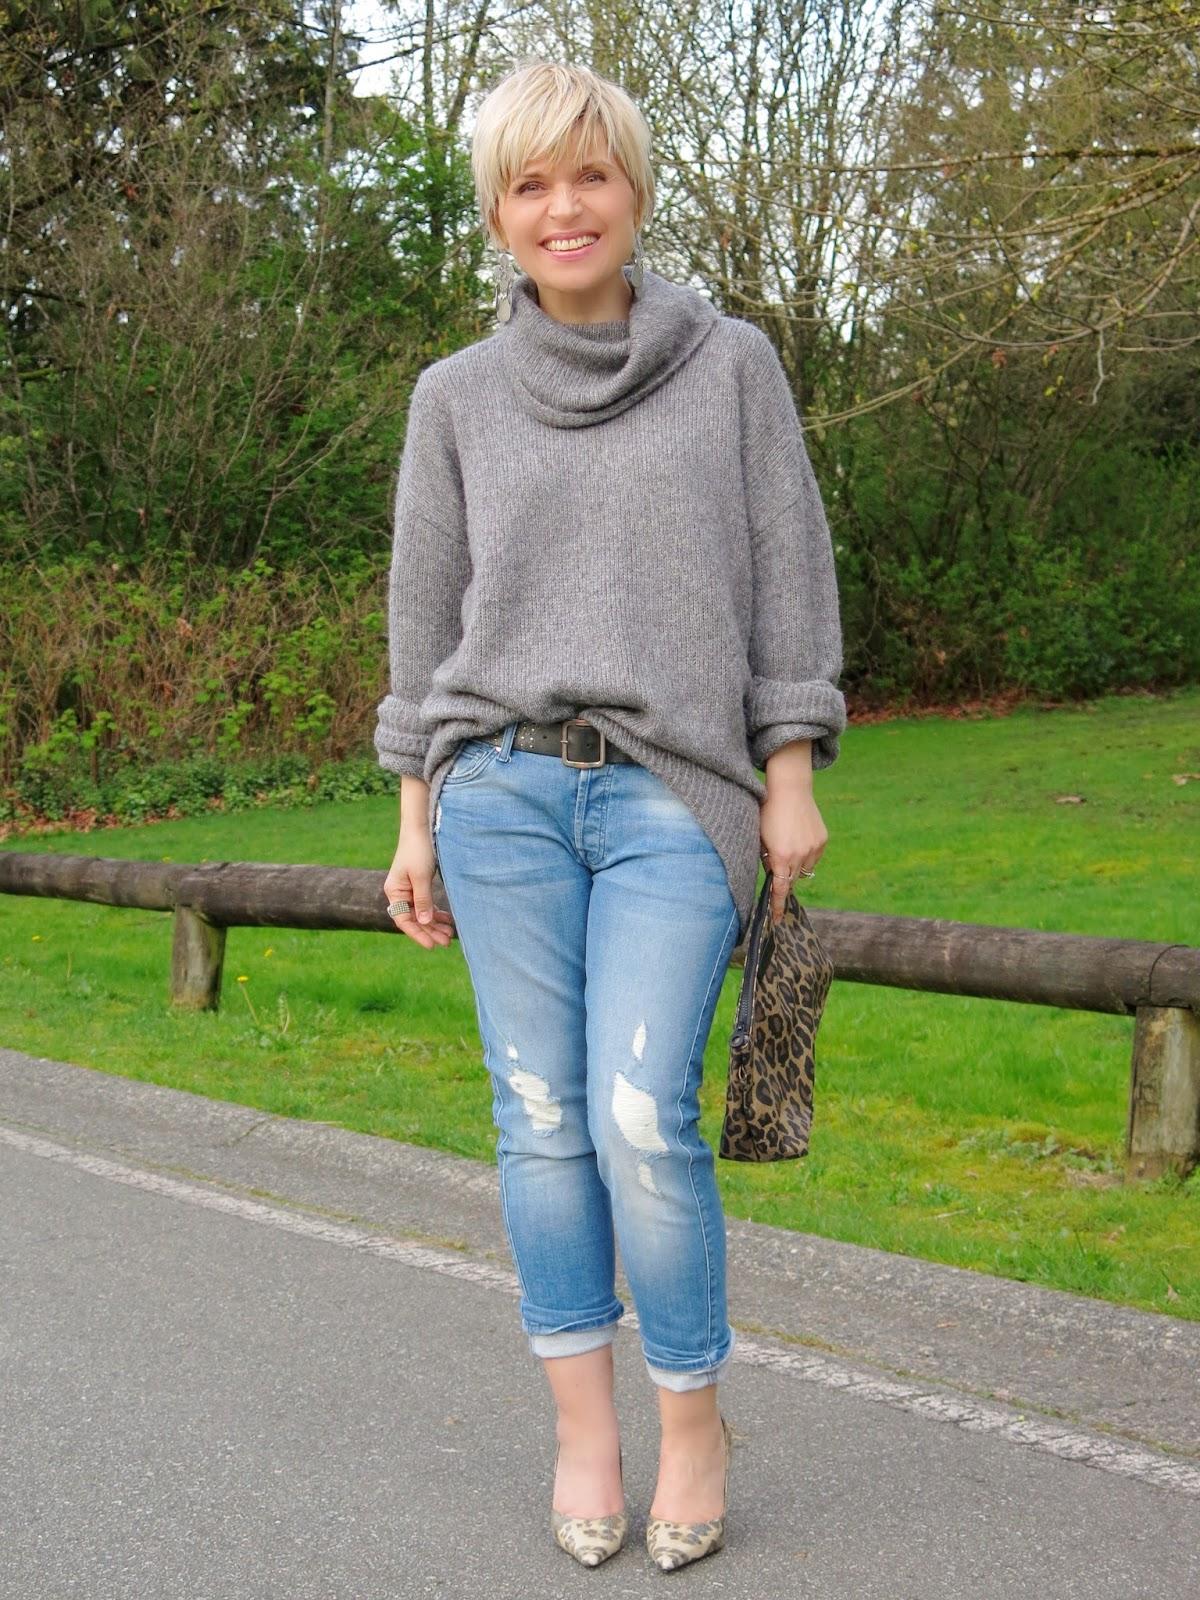 Grey matter: Boyfriend jeans and an oversized sweater ...